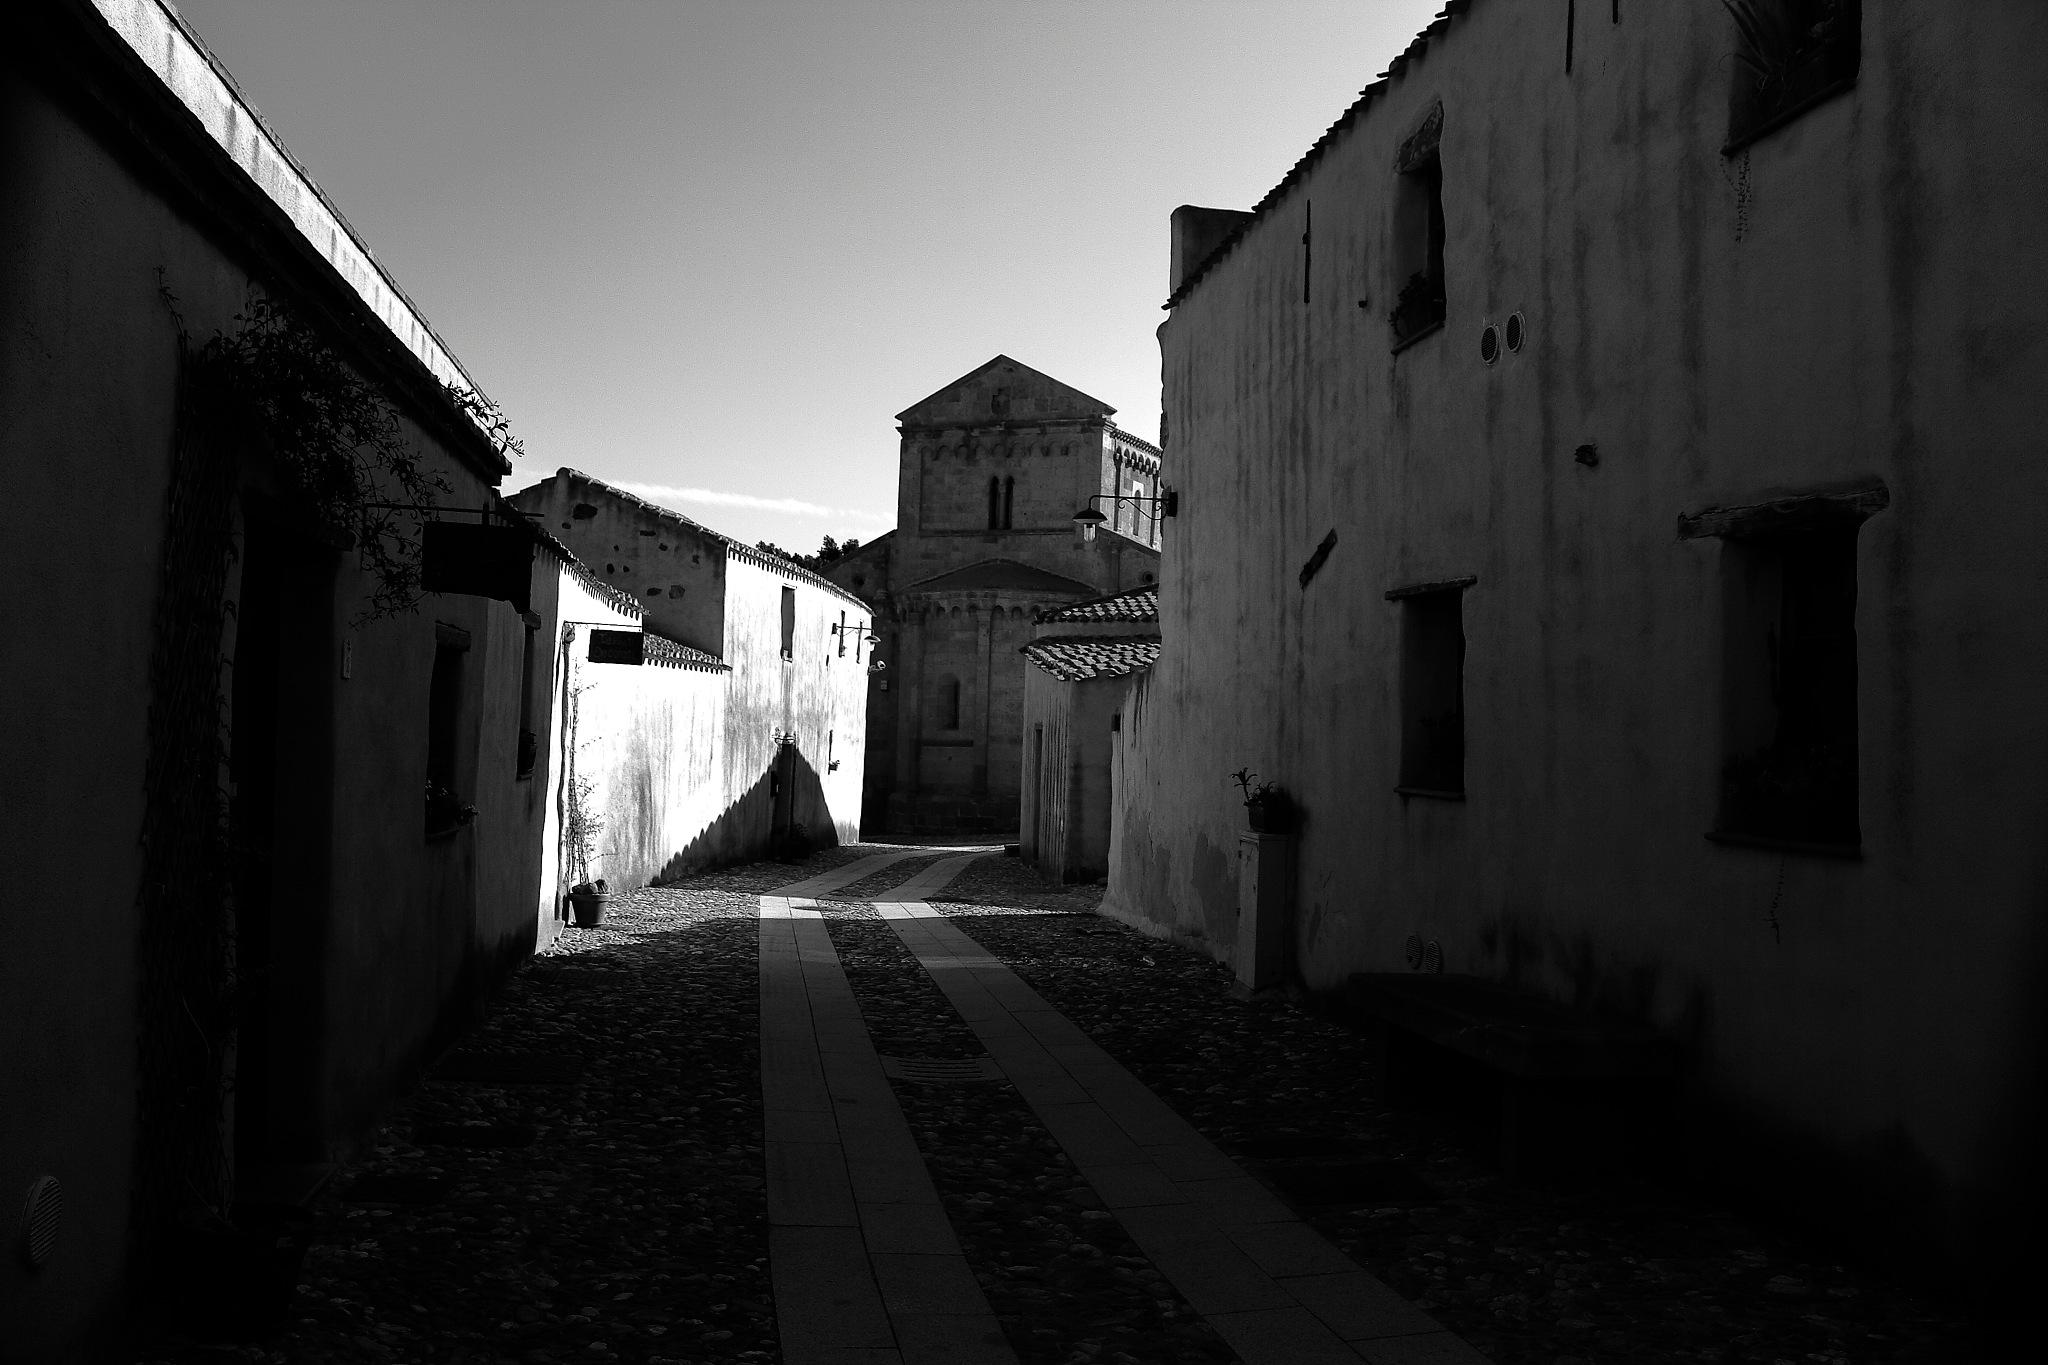 Antico borgo by Antonello Marceddu